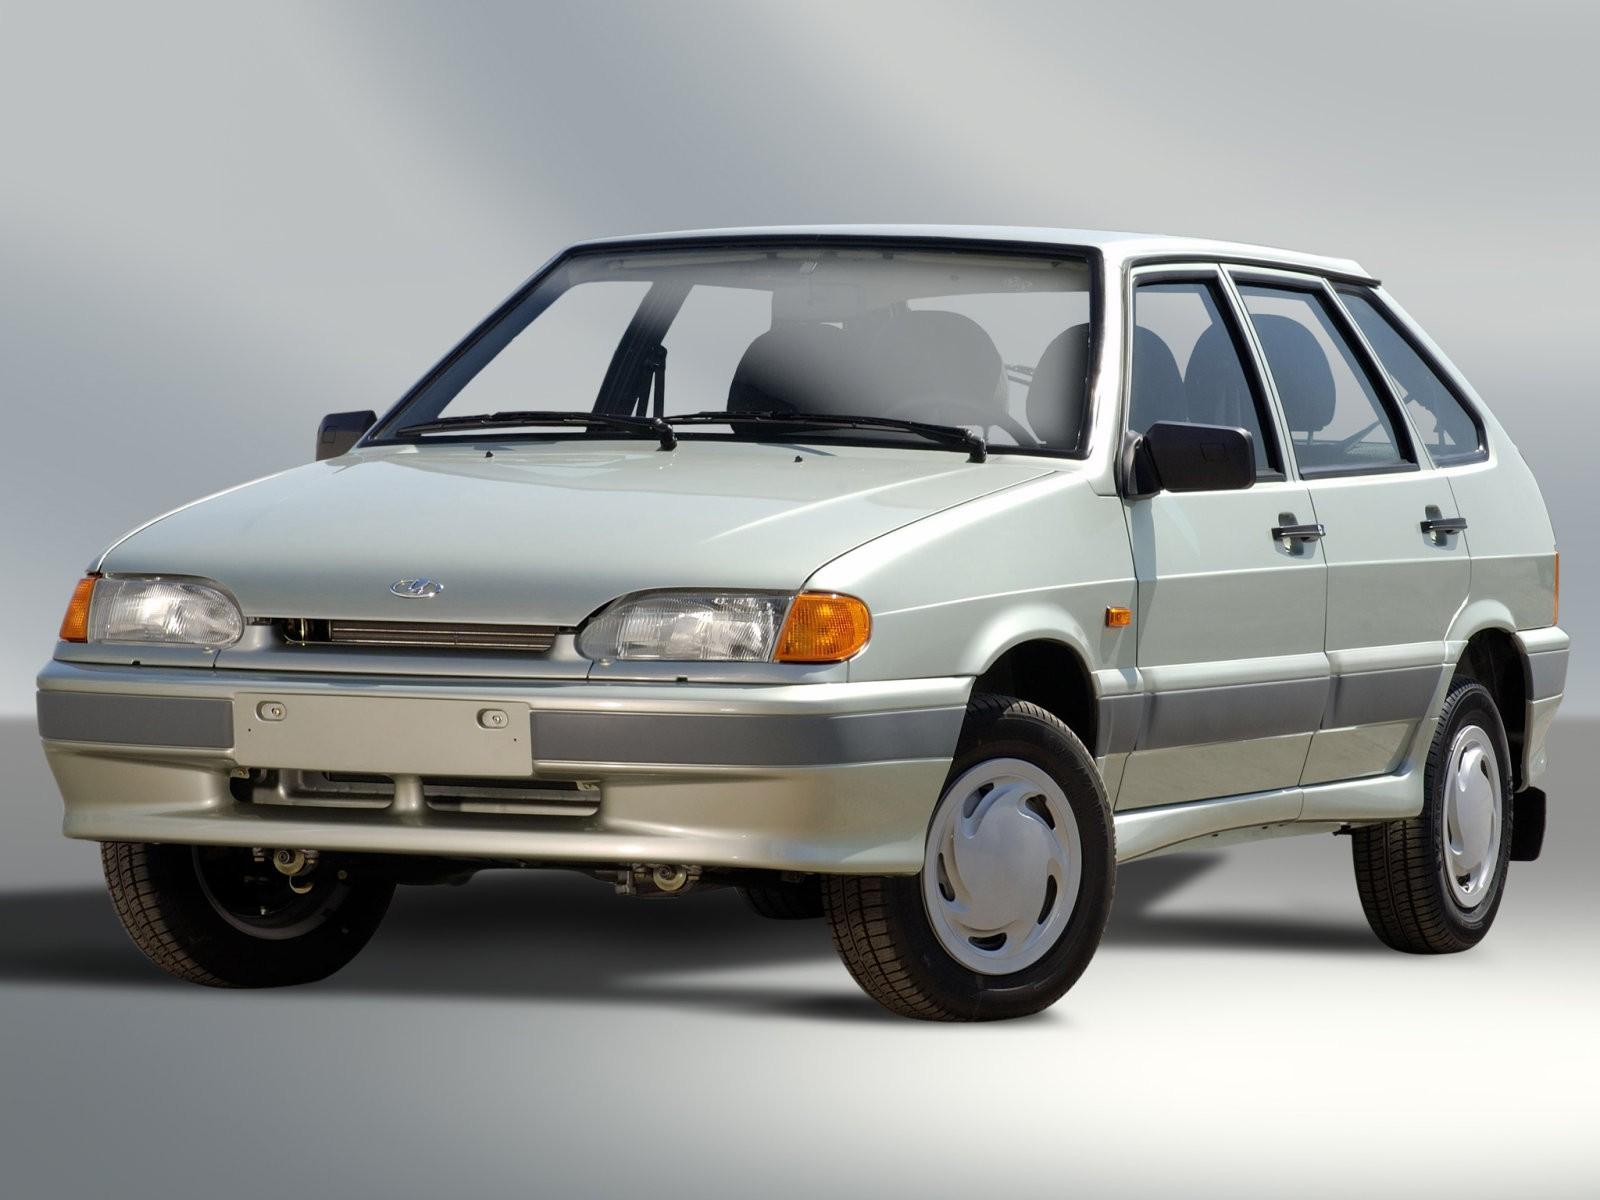 Продажи авто спробегом вновь начали расти